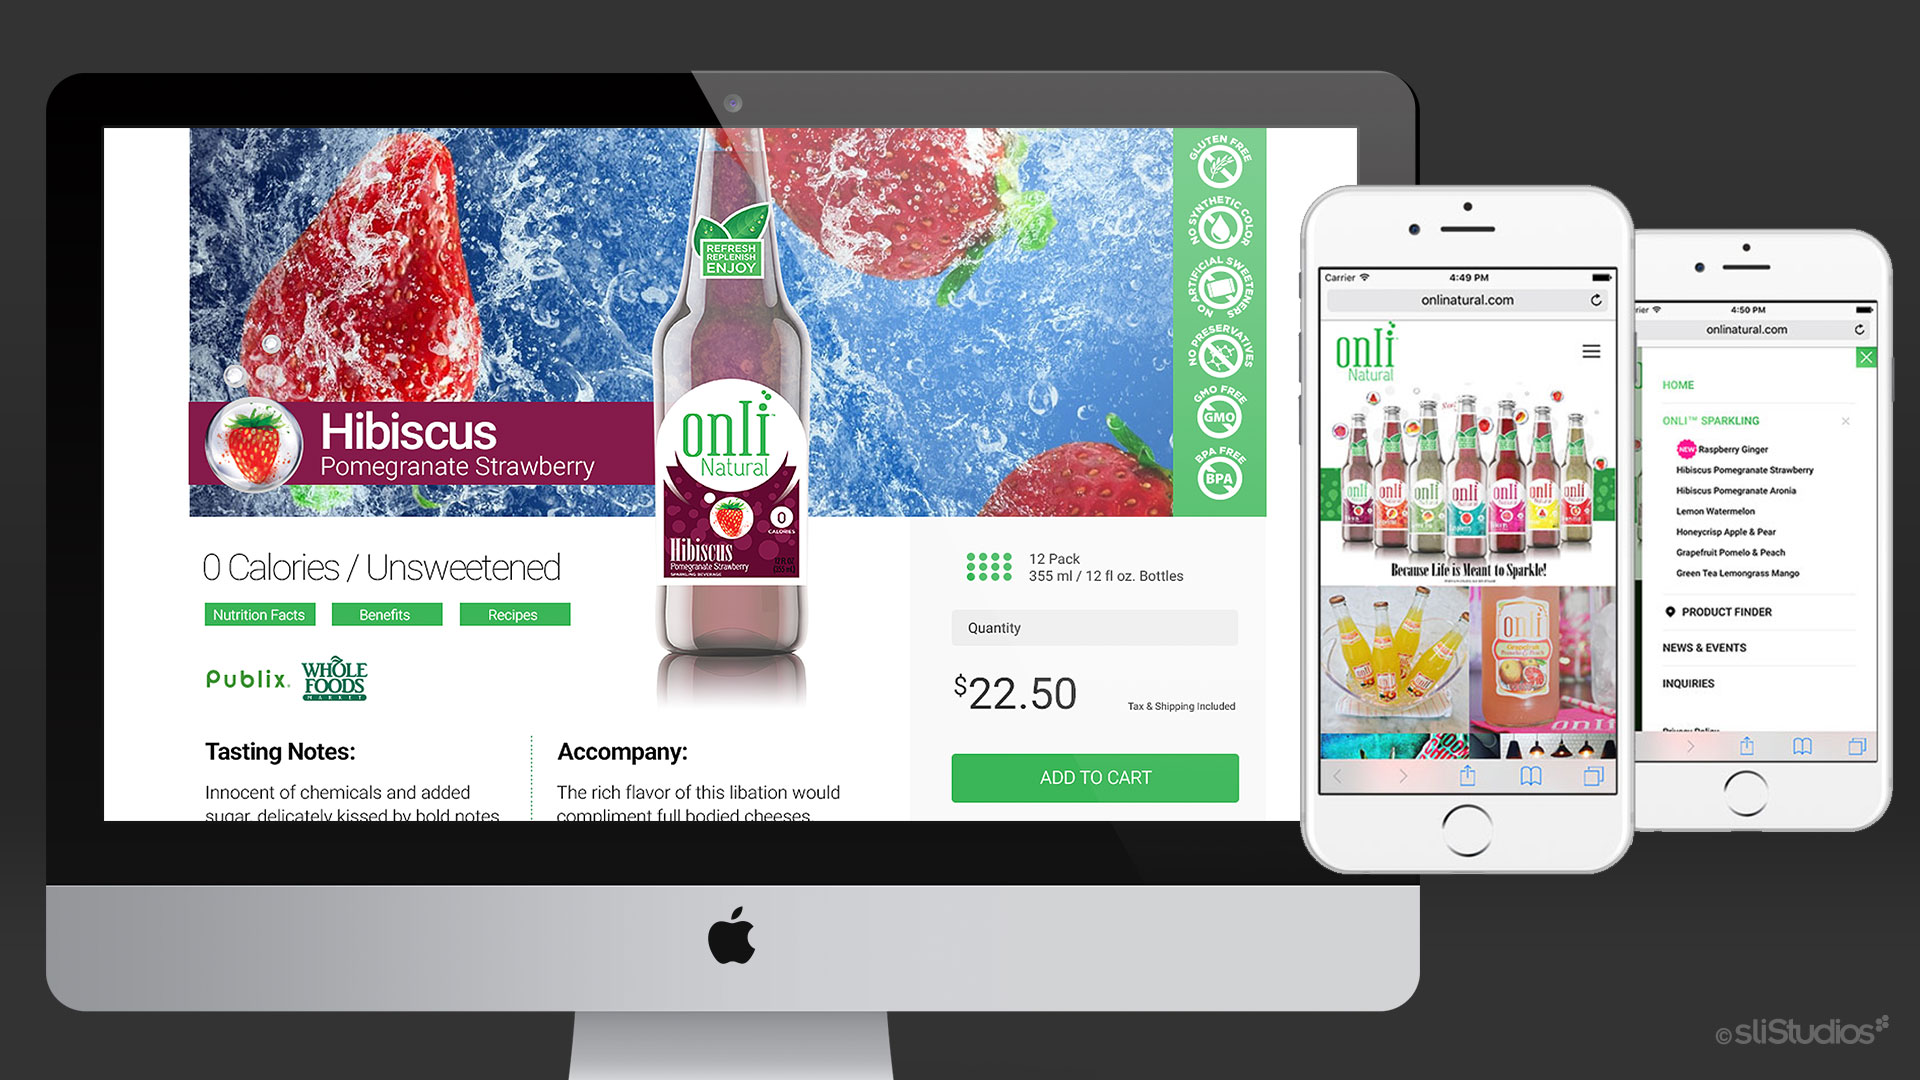 Onli Natural Website Design